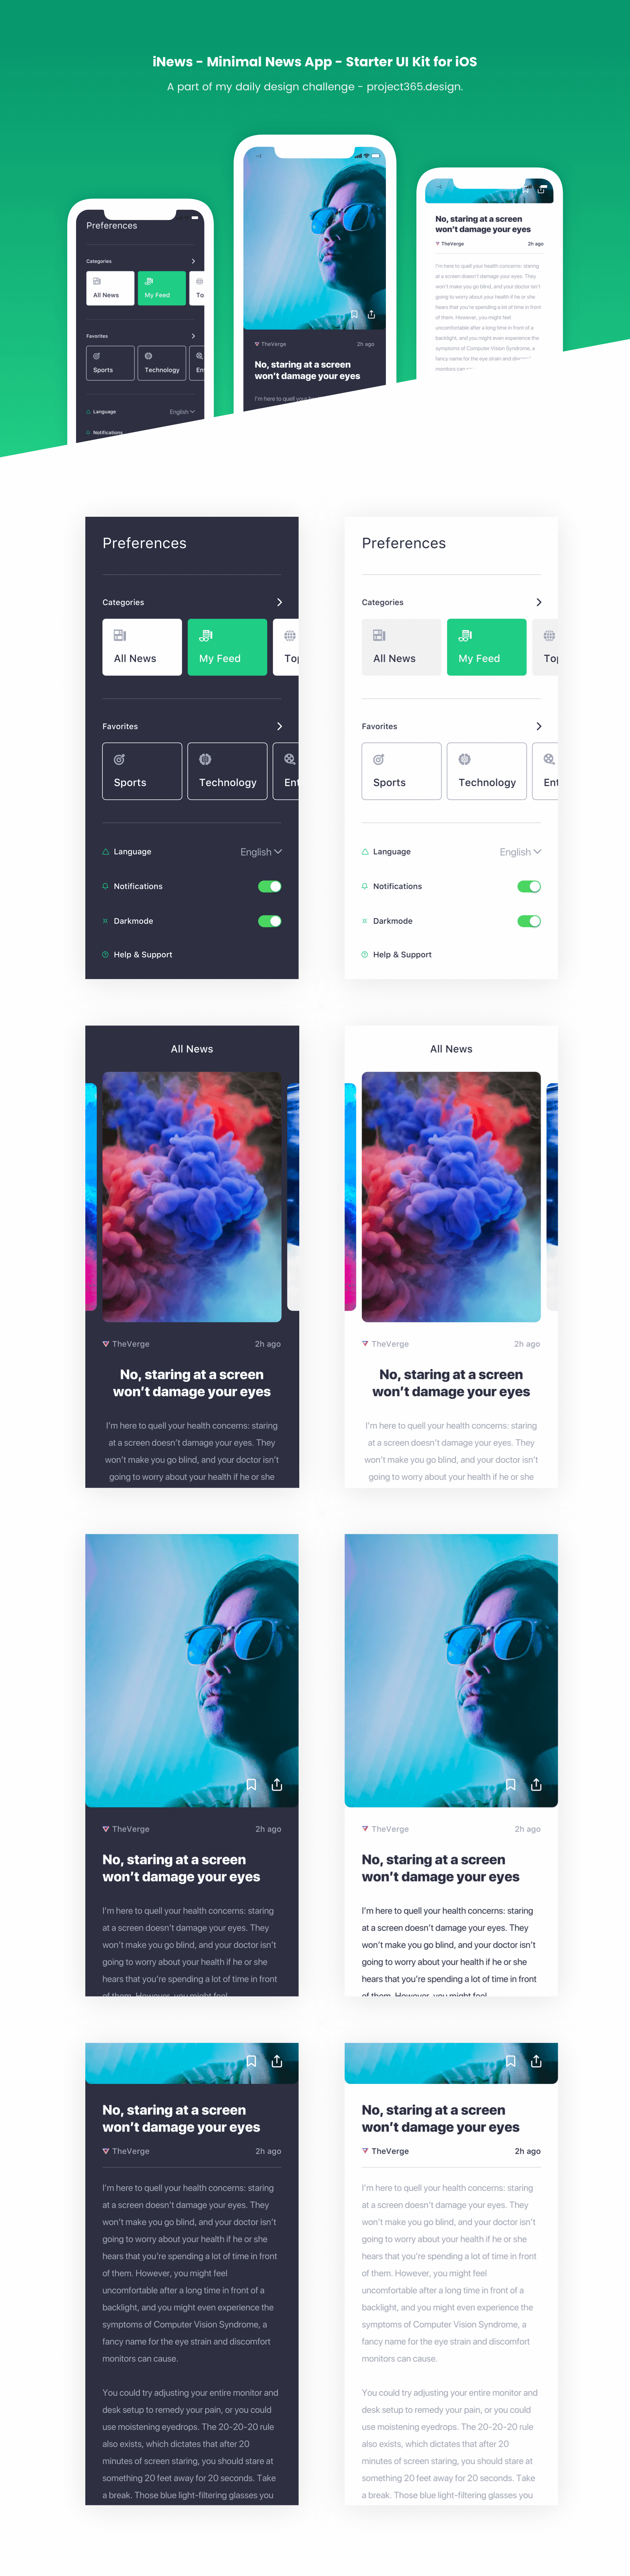 iNews - iOS UI Kit | Day 138/365 - Project365 presentation image